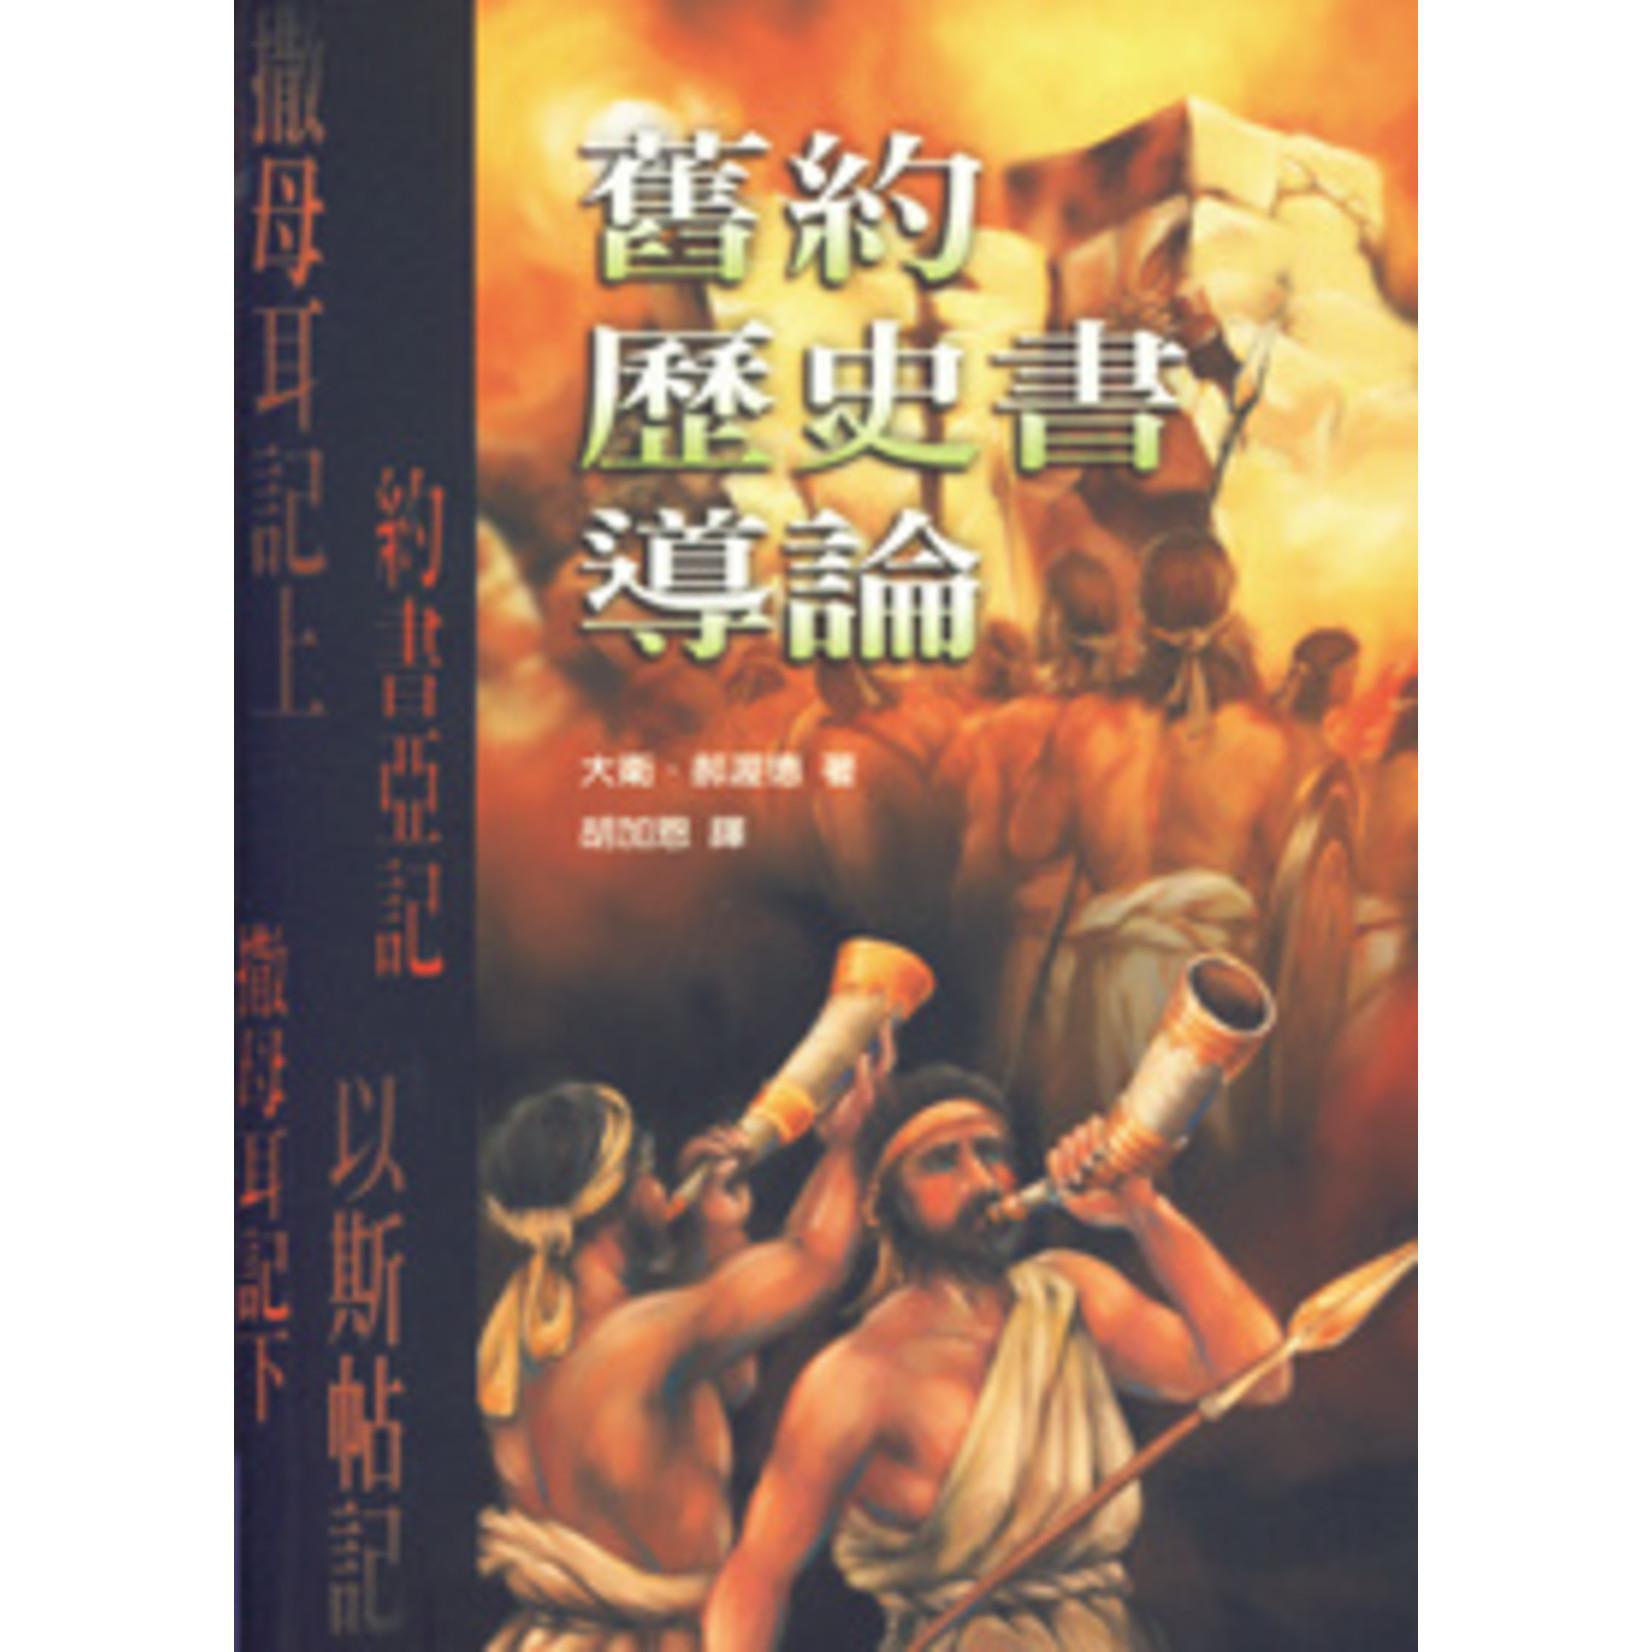 中華福音神學院 China Evangelical Seminary 舊約歷史書導論 An Introduction to the Old Testament Historical Books